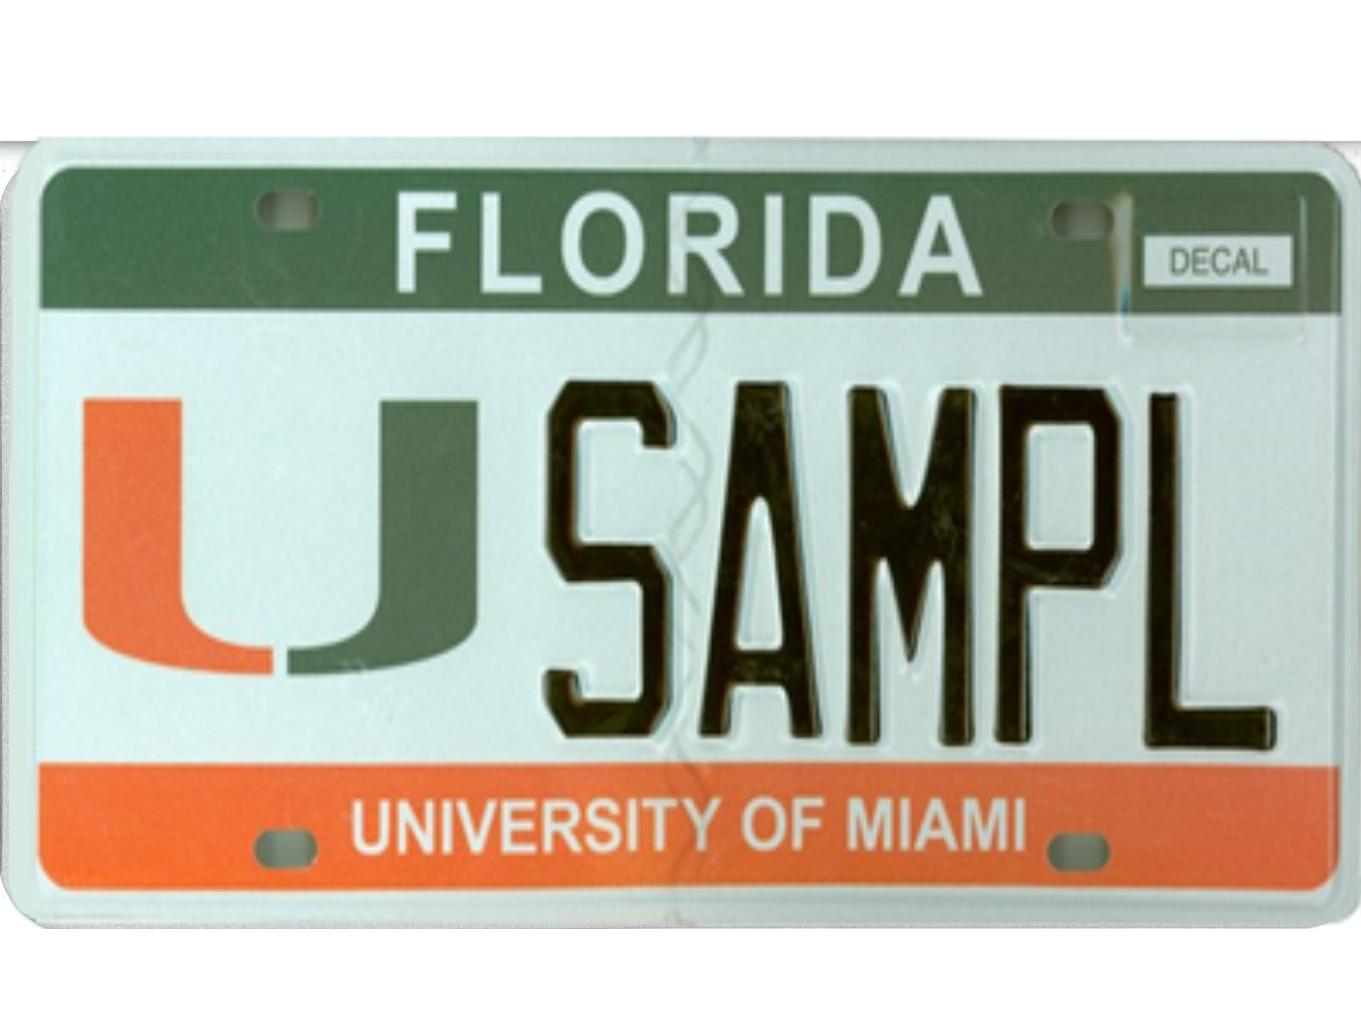 The University of Miami license plate.